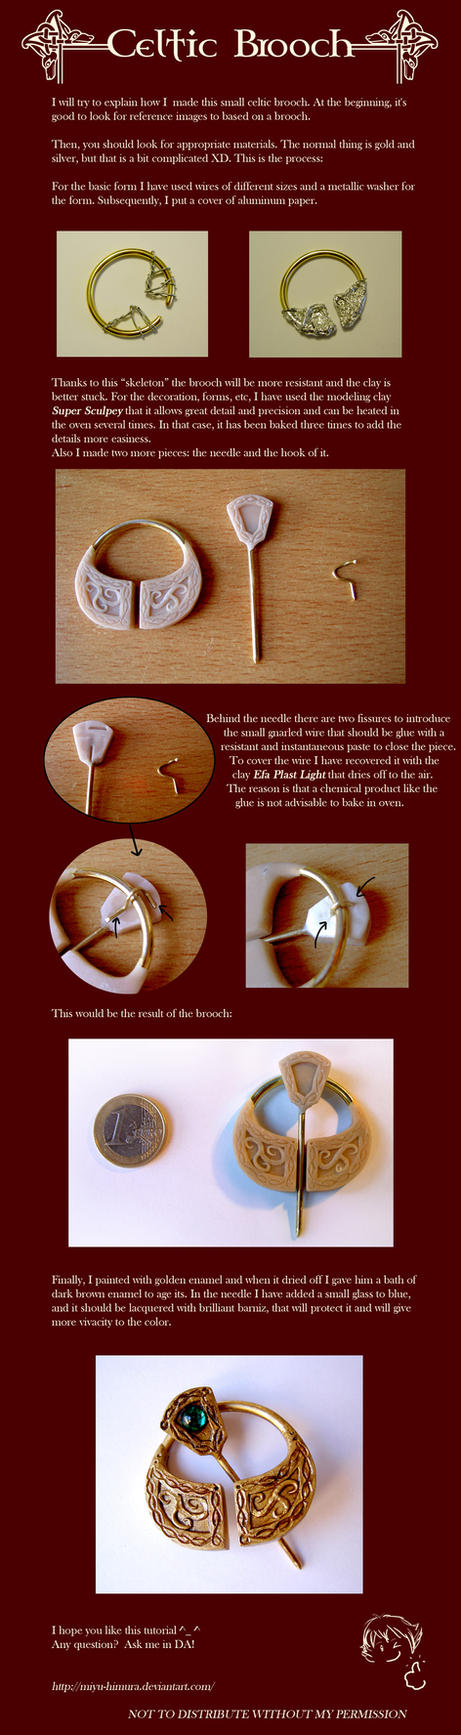 Tutorial - Celtic brooch by Boudicca-Keltoi